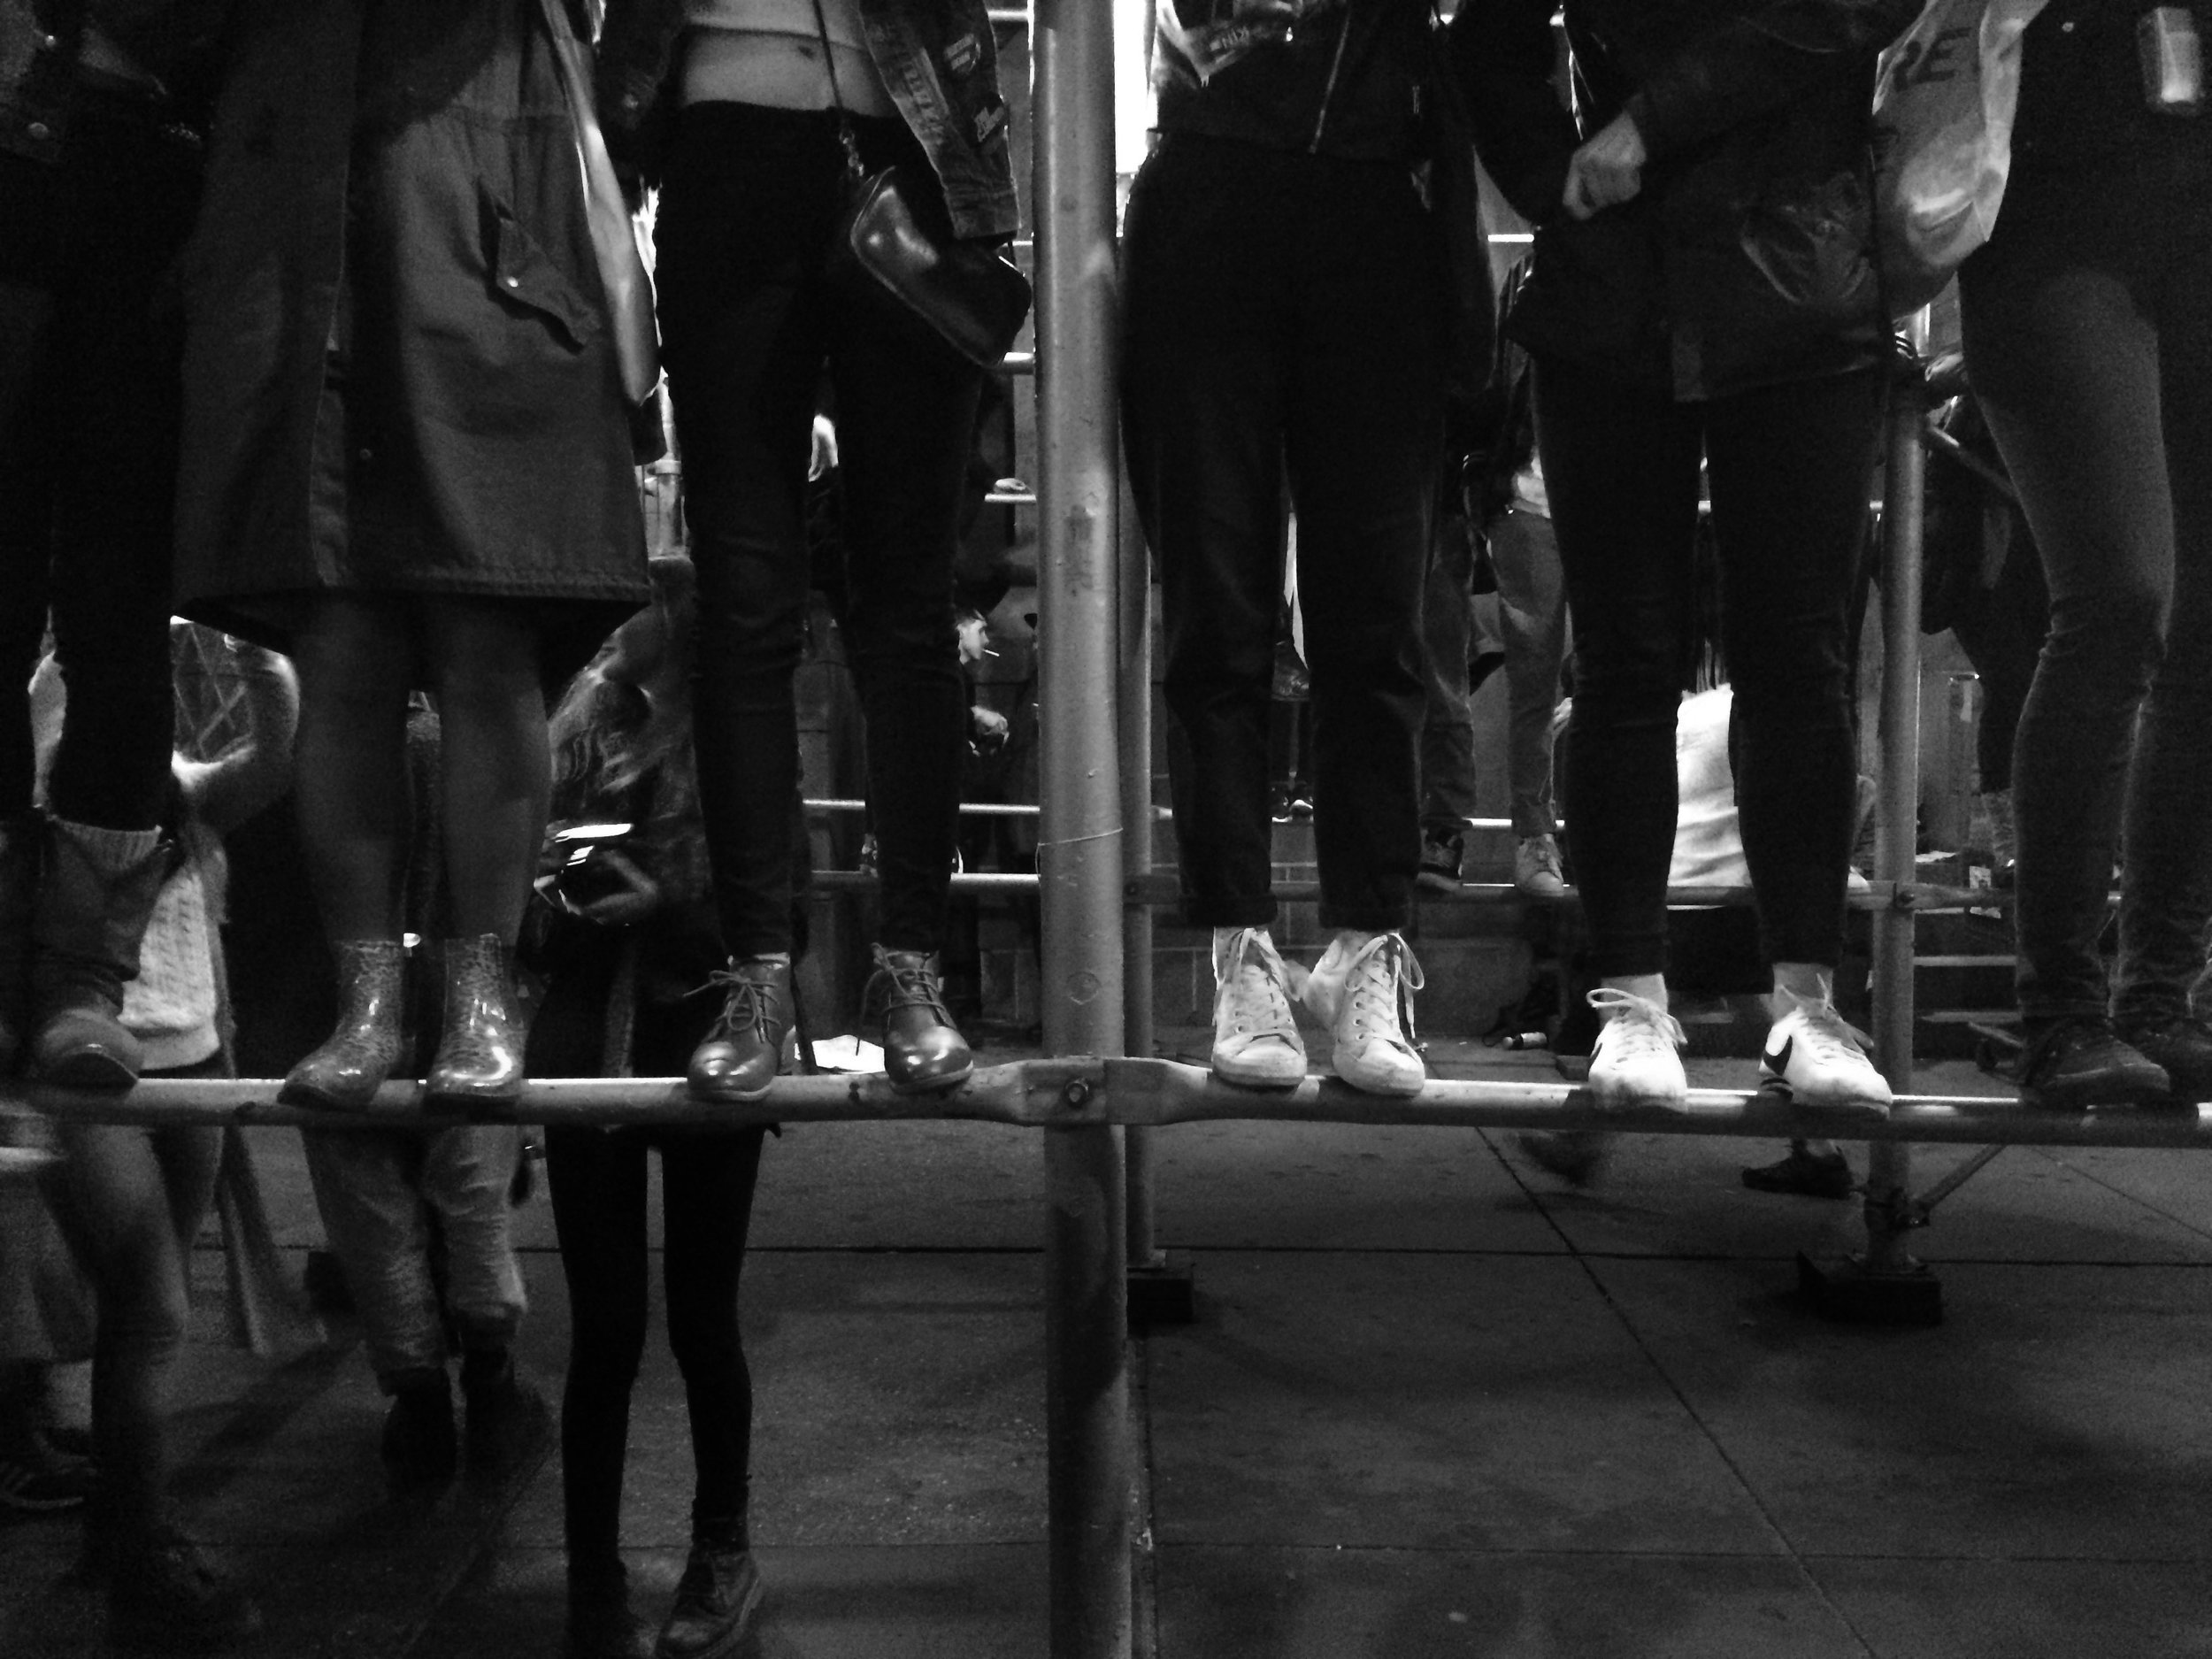 Women standing tall against Trump